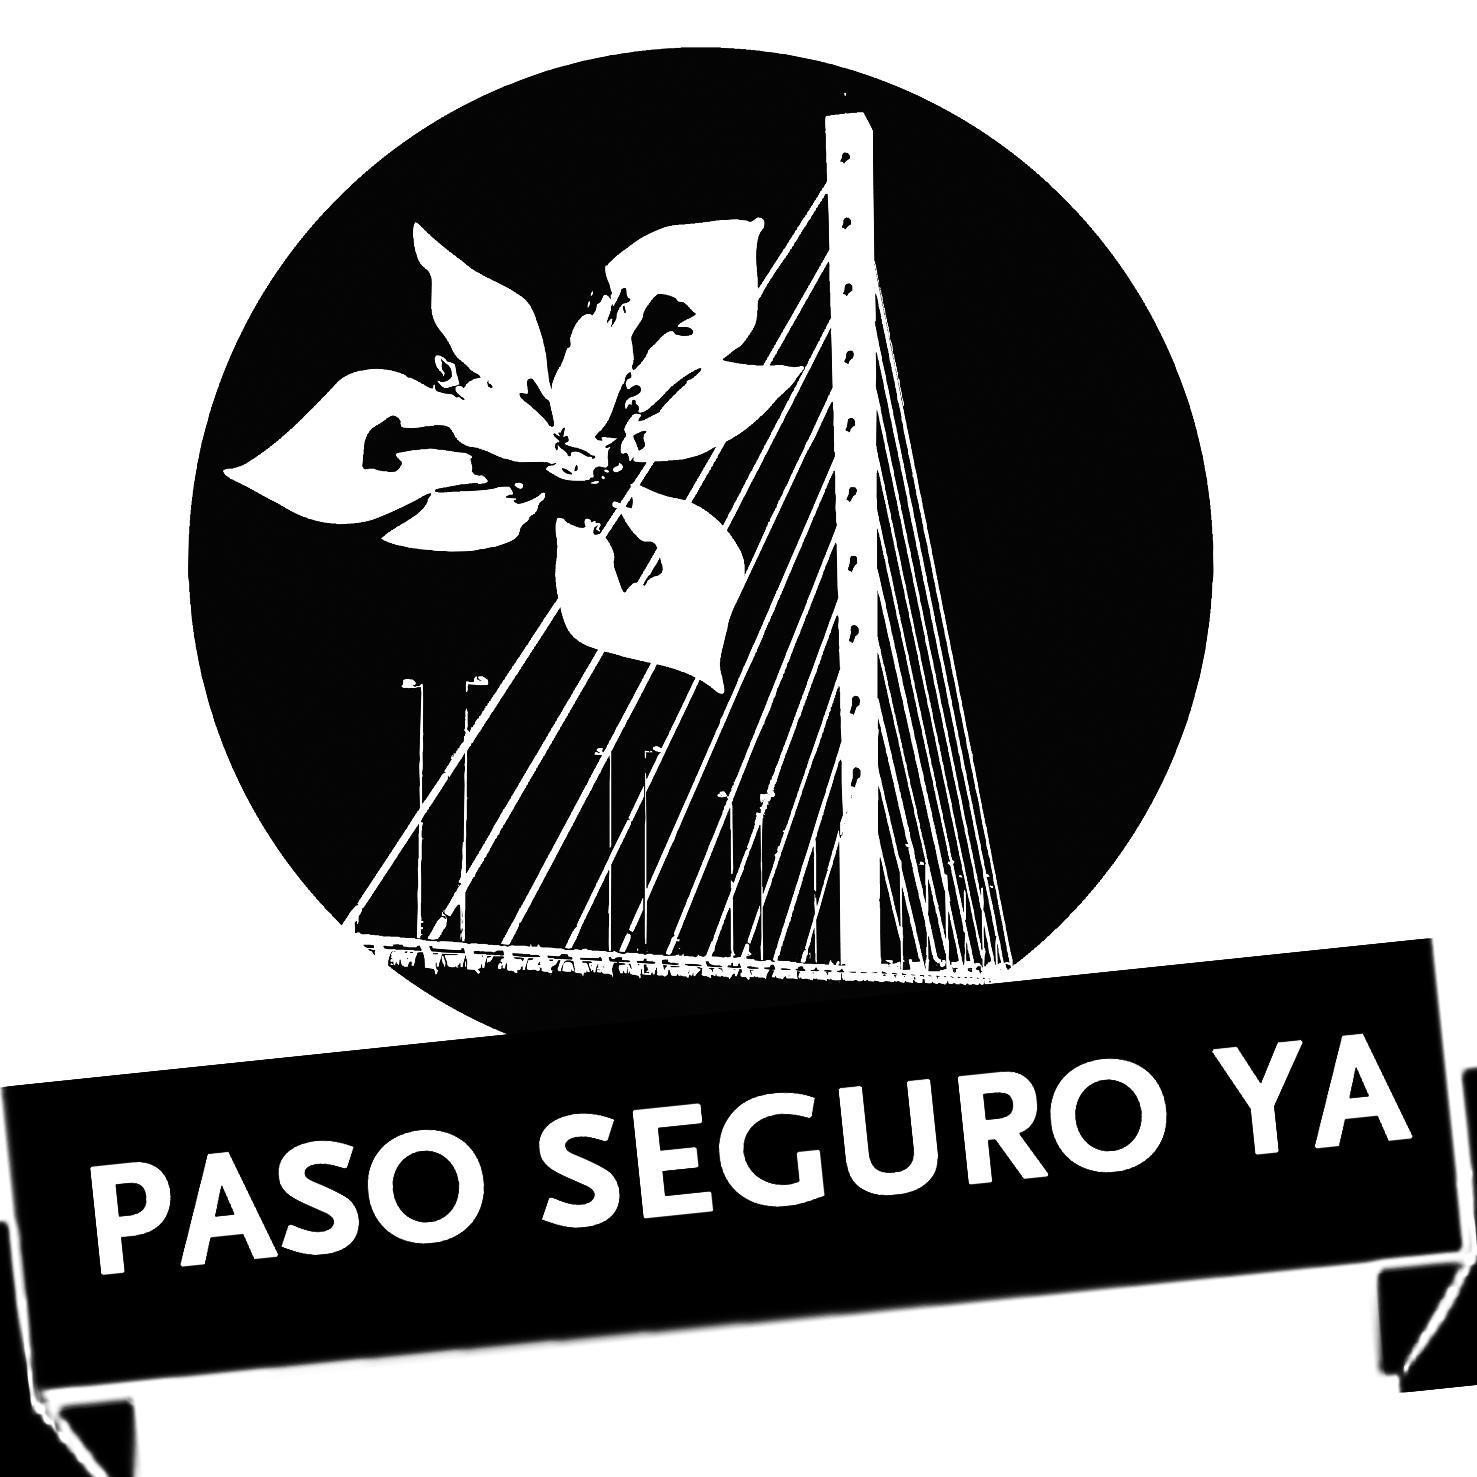 AAVV Los Lirios del Iregua profile, rate, communicate and discover